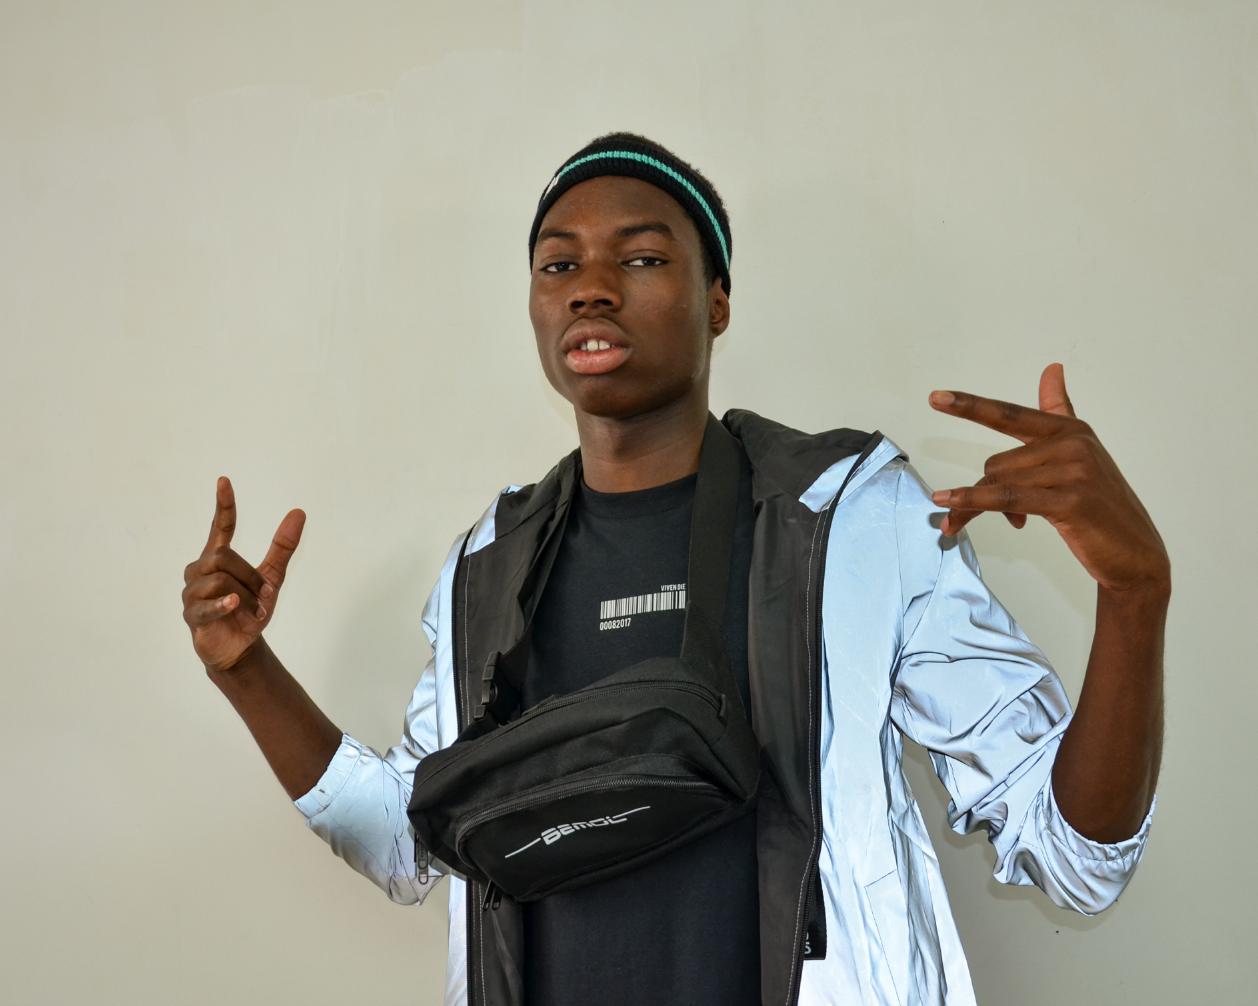 Superbe_media_urbain_paris_lifestyle_france_rap_swetchy_music_11